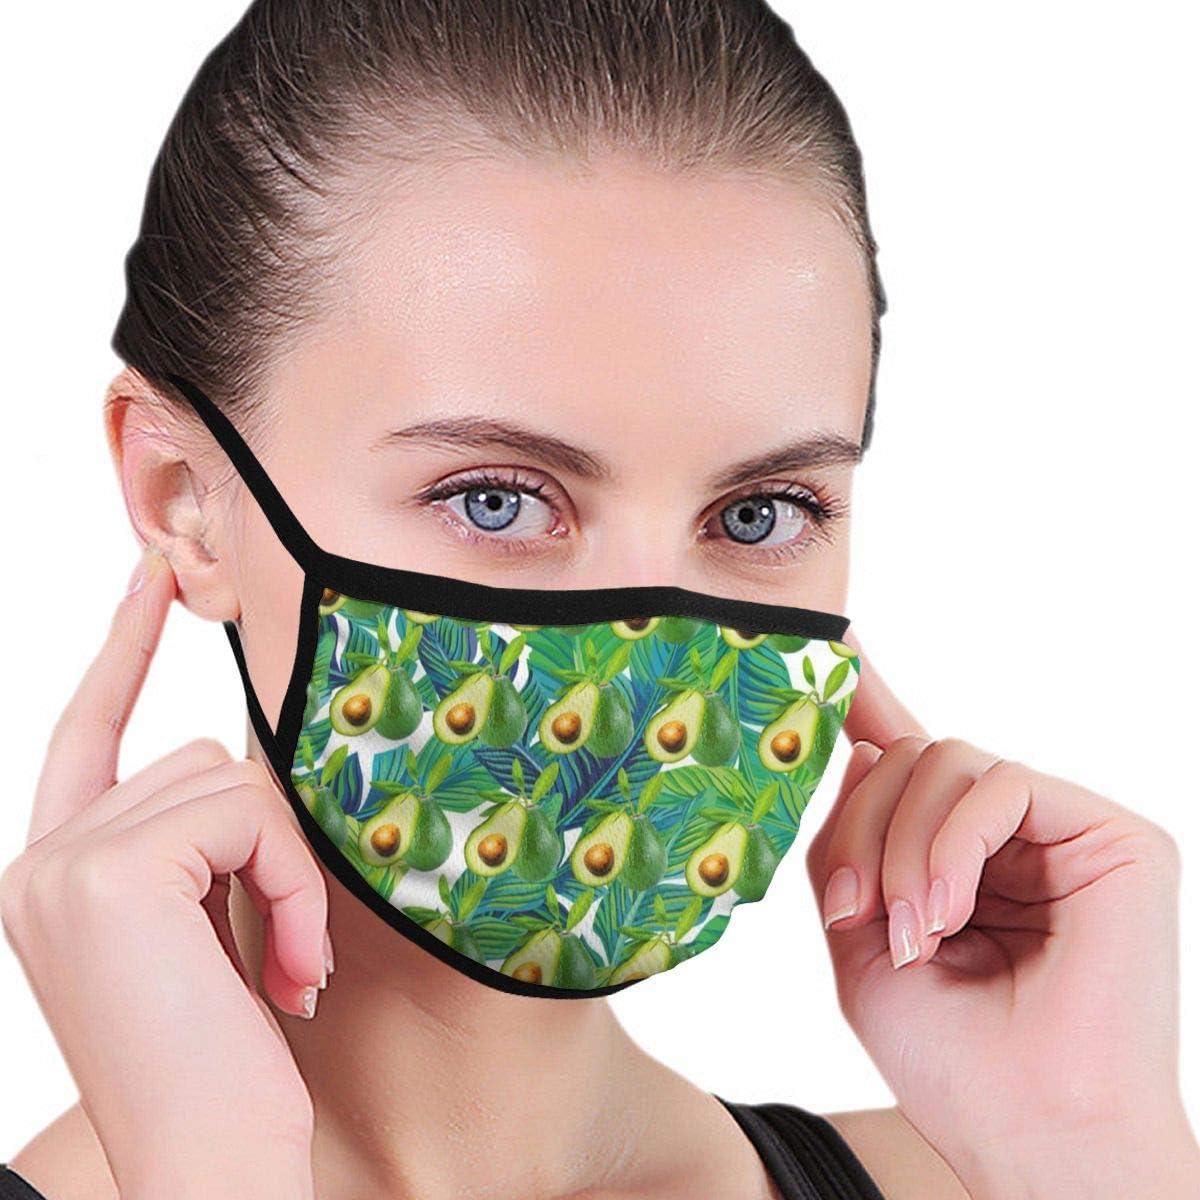 Basketball Surface TextureMen's Women's Print Warm Washable Reusable Ear Warmer Neck Warmer Construction Mouth Wear